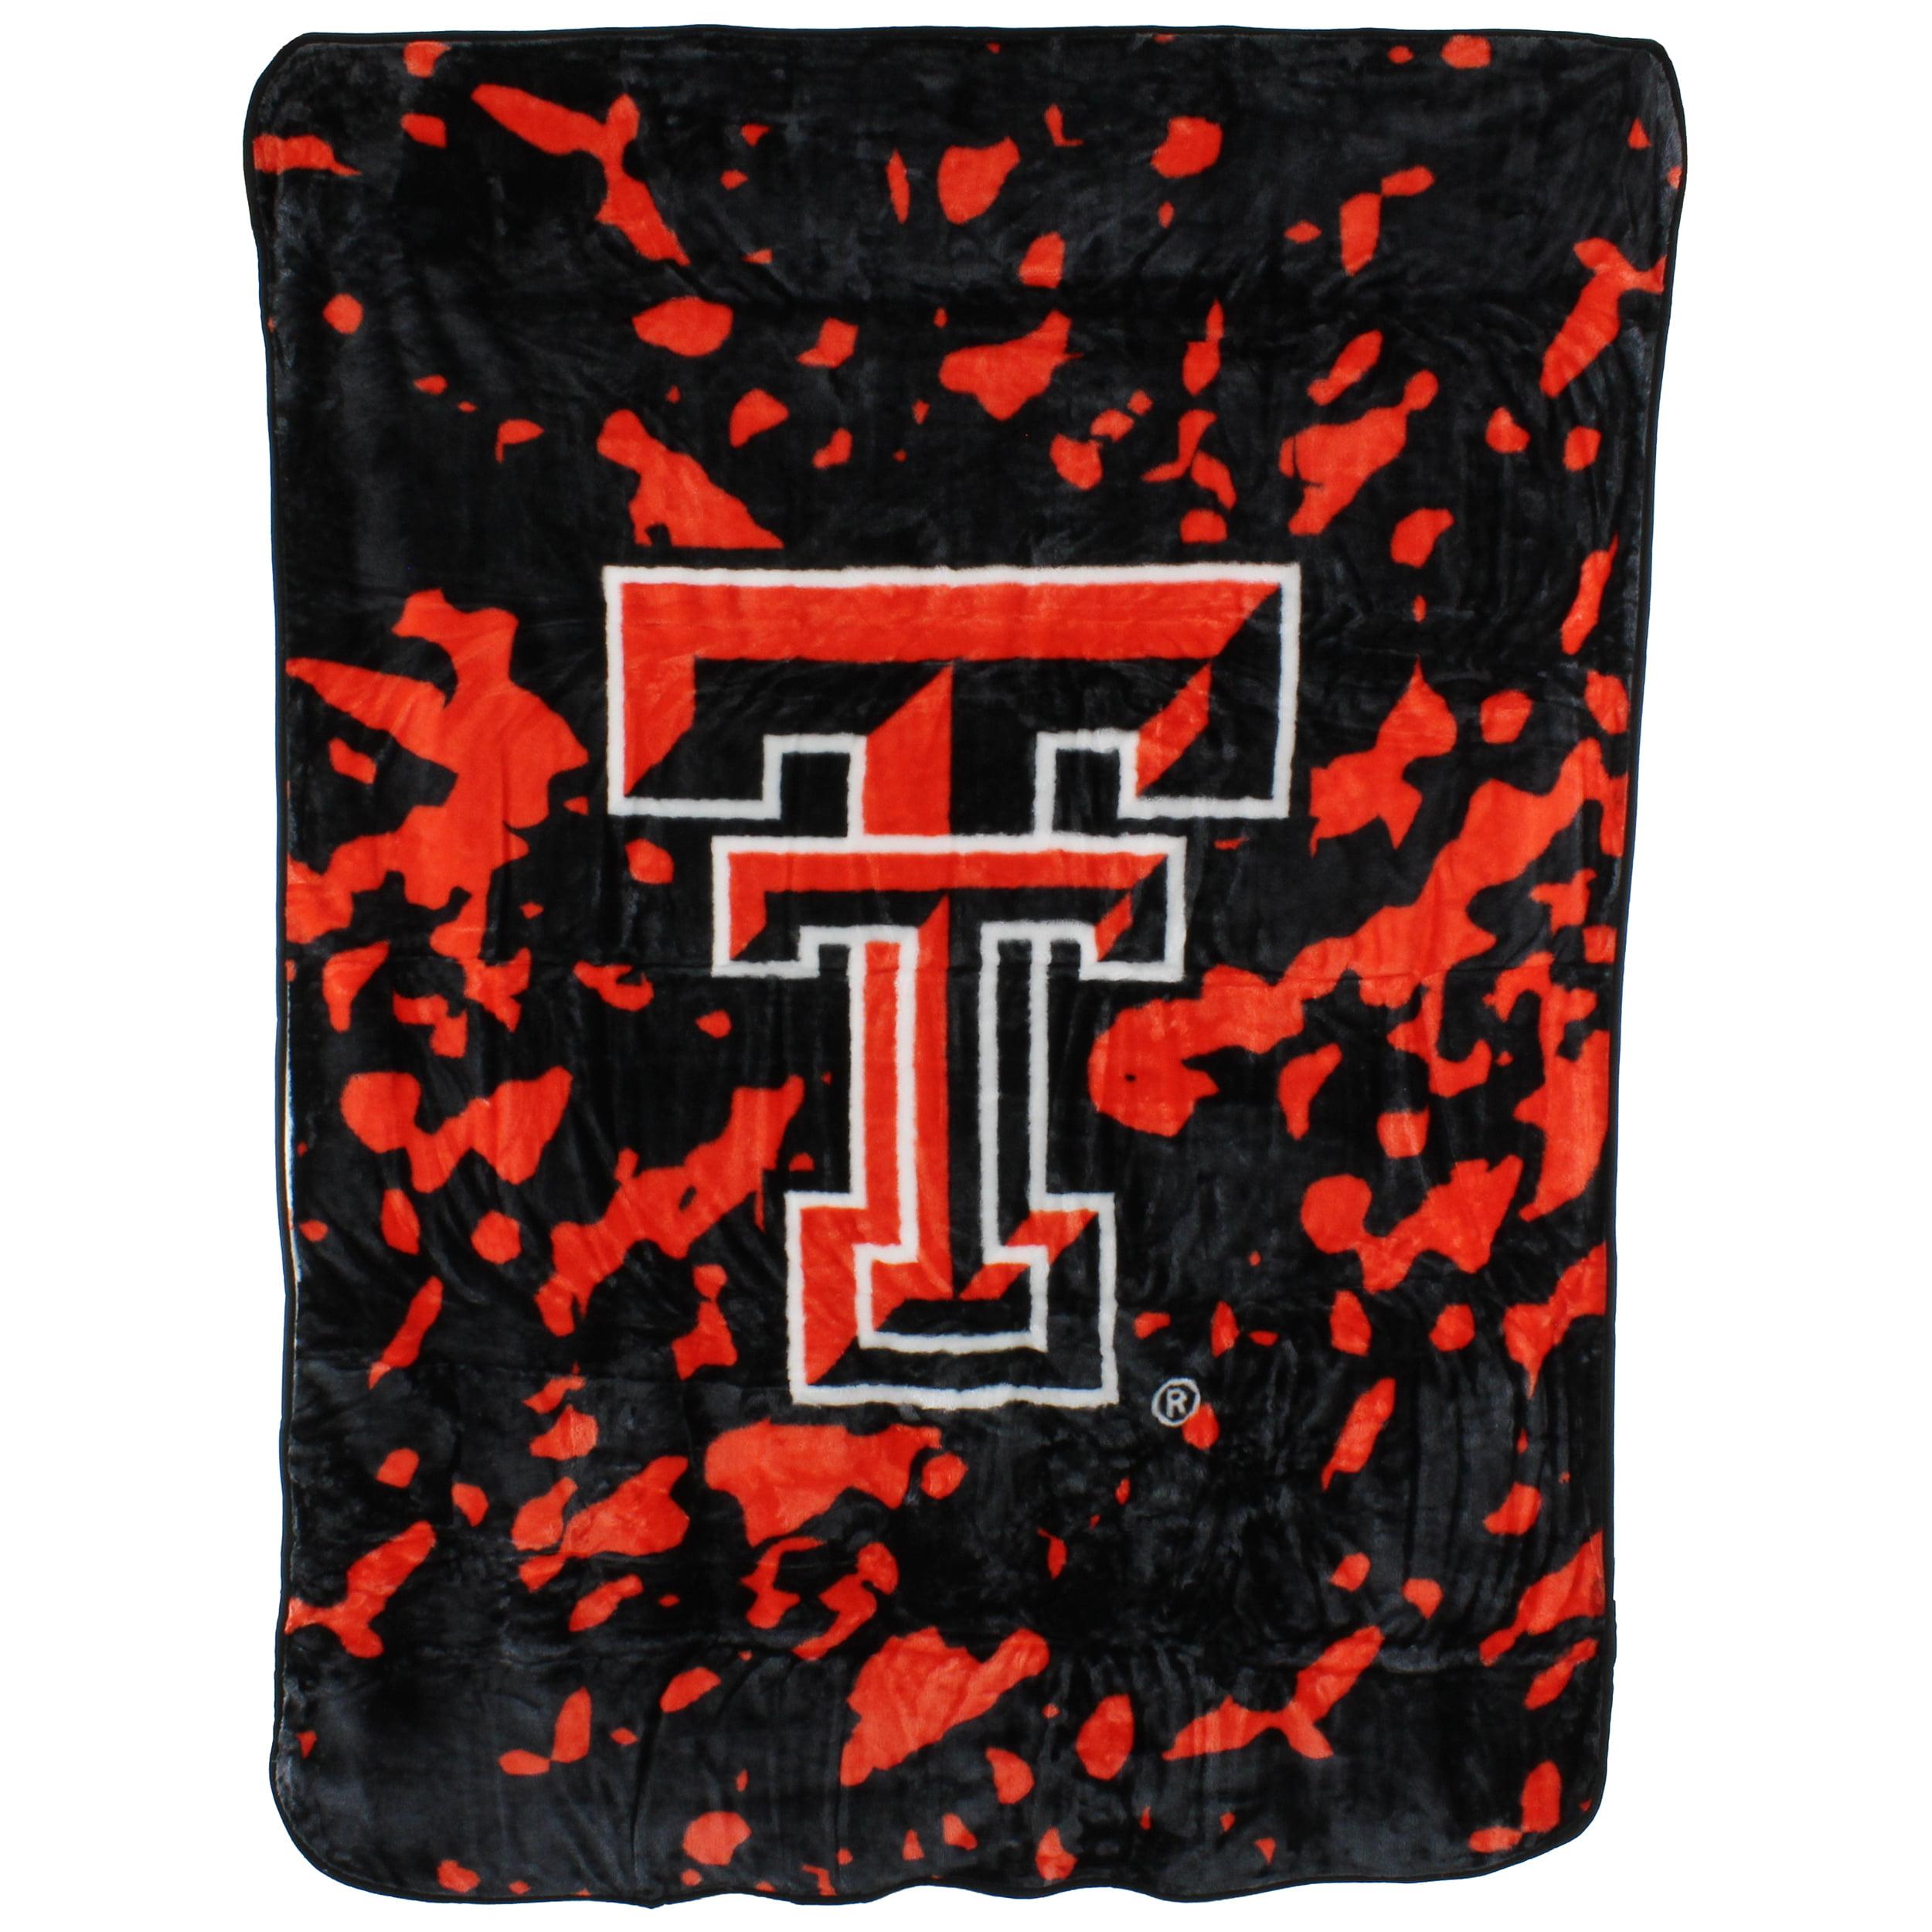 "College Covers Fan Shop Throws Texas Tech Red Raiders 63"" x 86"" Soft Raschel Throw Blanket"